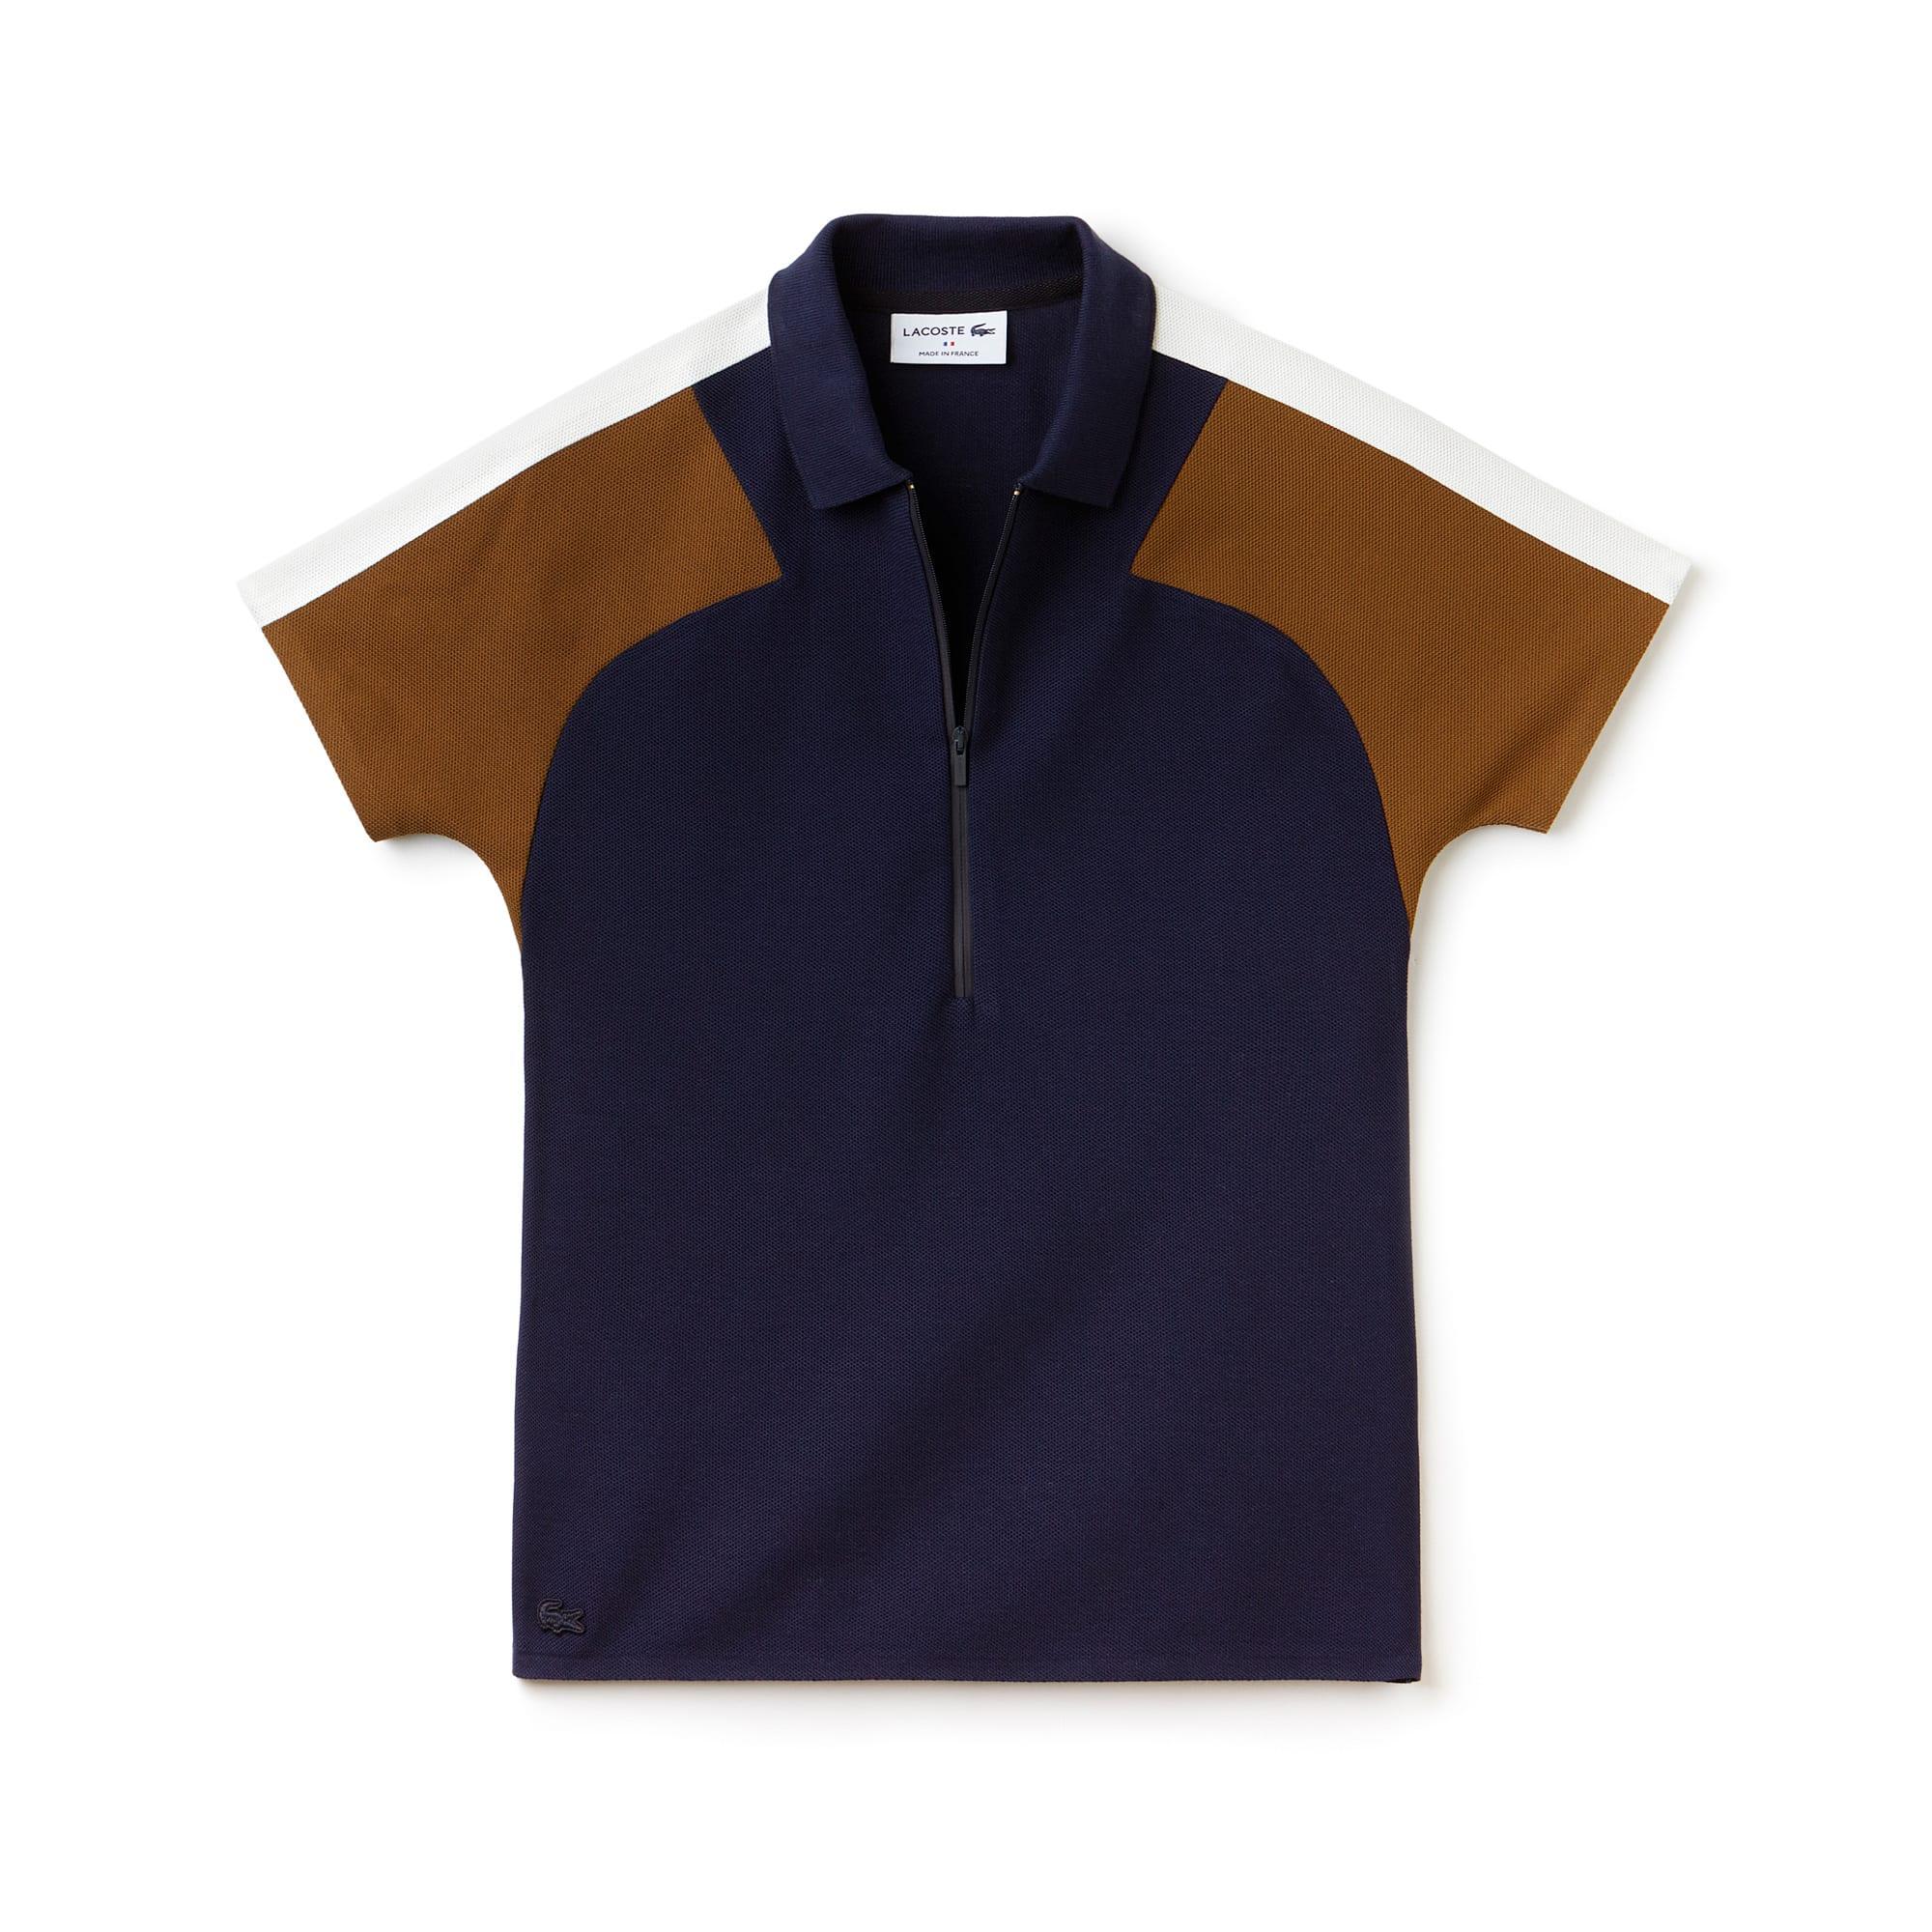 Polo Lacoste Made In France Slim Fit Feminina em Piqué com Zíper